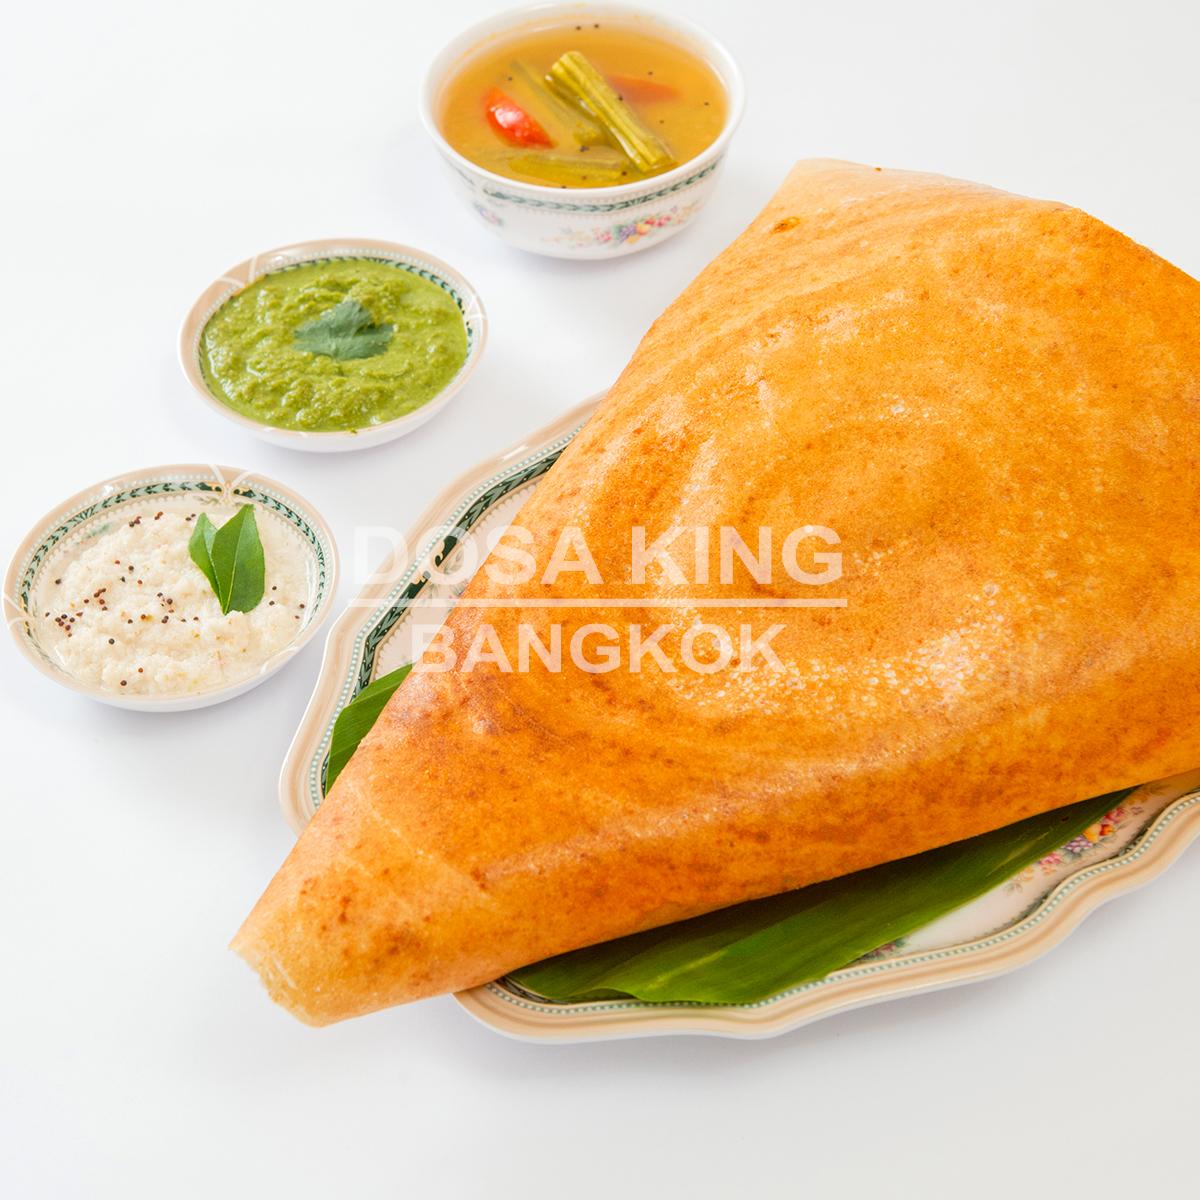 Dosa • DOSA KING • 100% Pure Indian Vegetarian